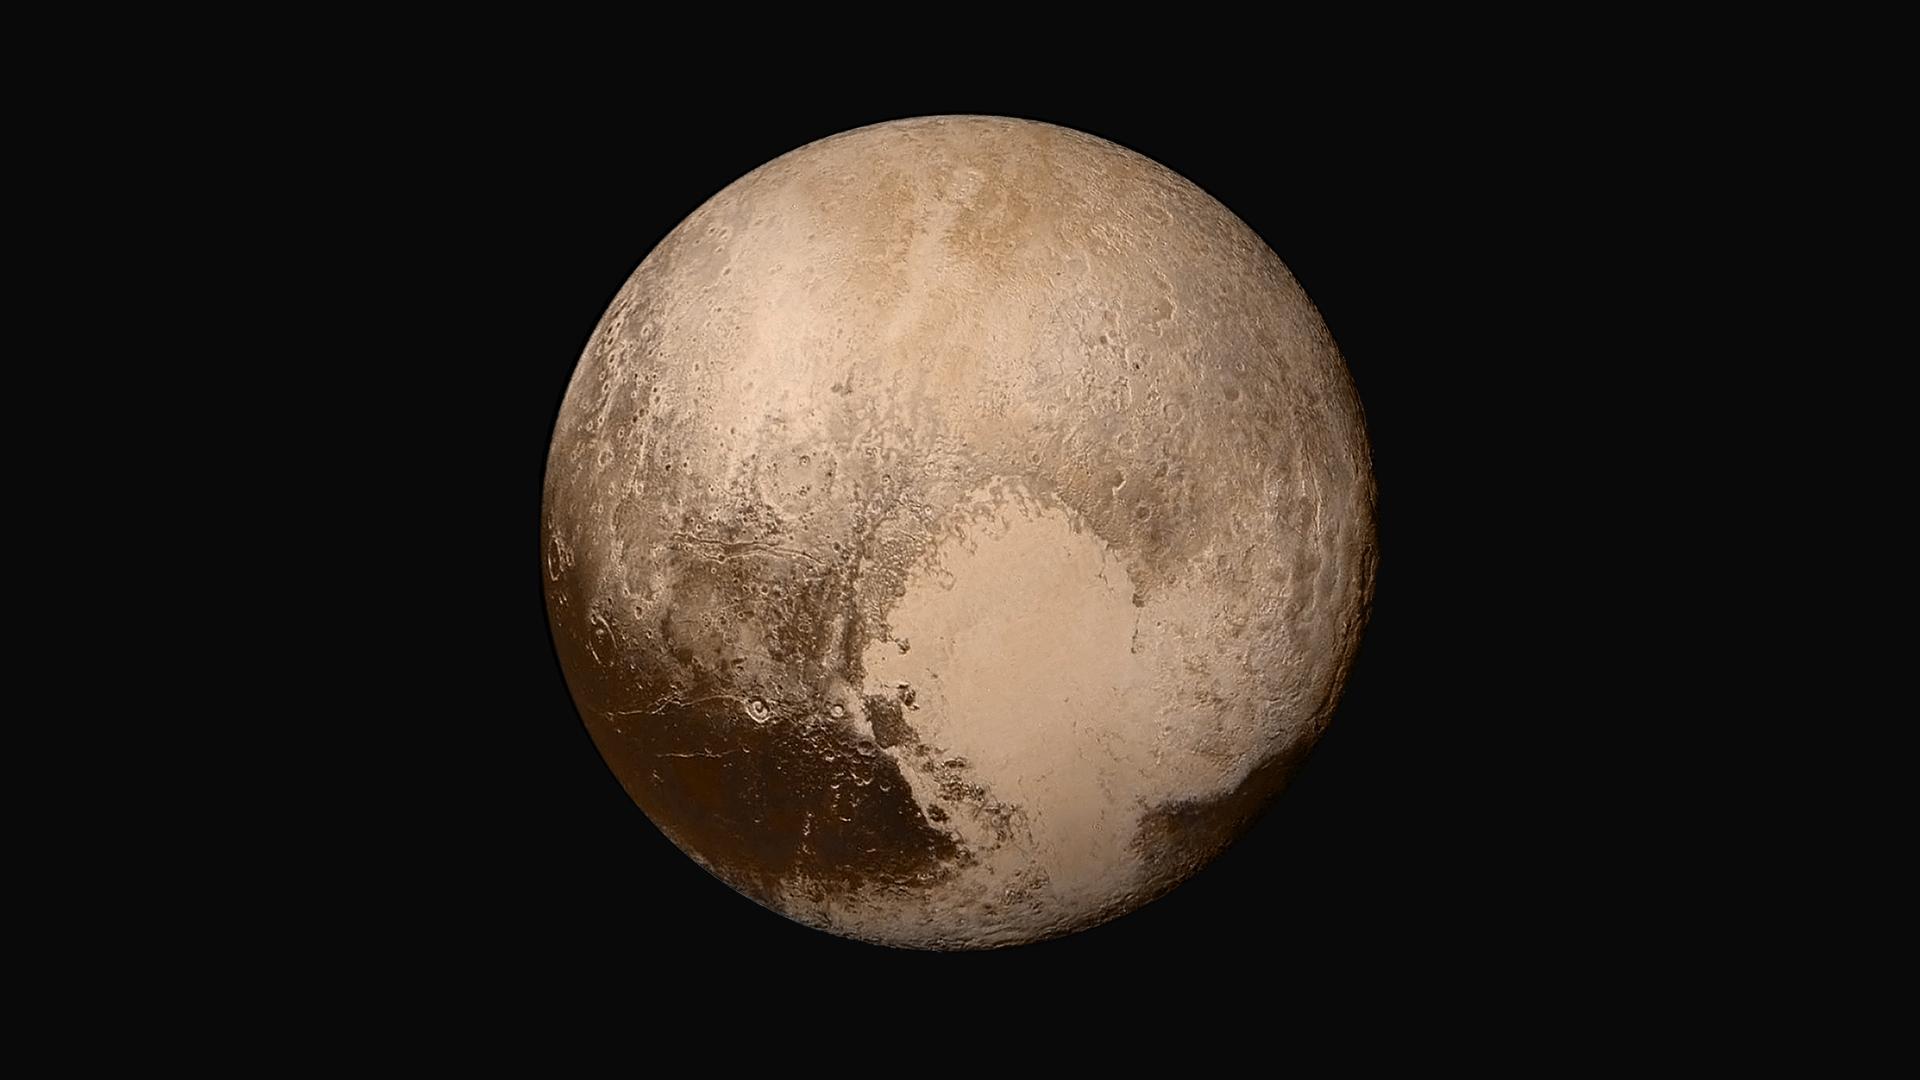 Fünf Jahre New-Horizons-Vorbeiflug am Pluto